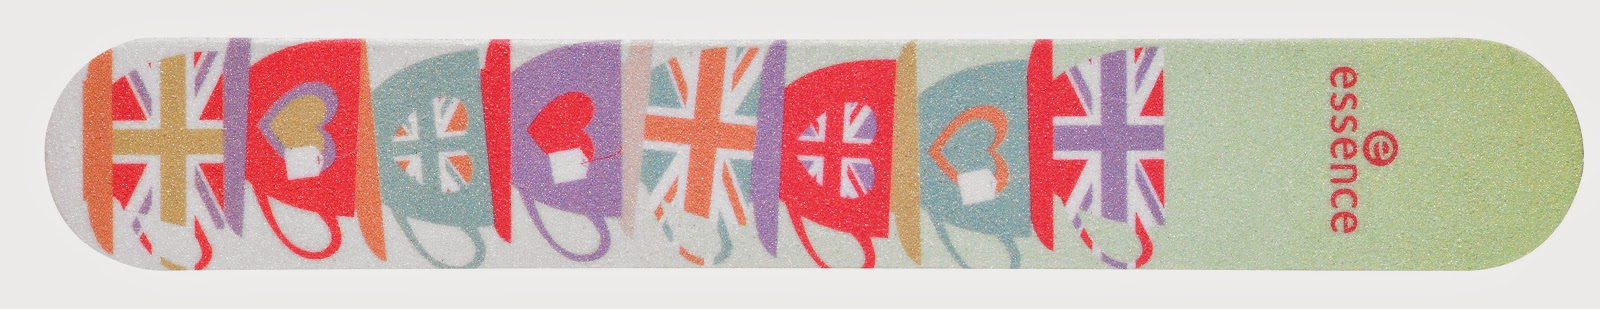 essence brit-tea – nail file - www.annitschkasblog.de